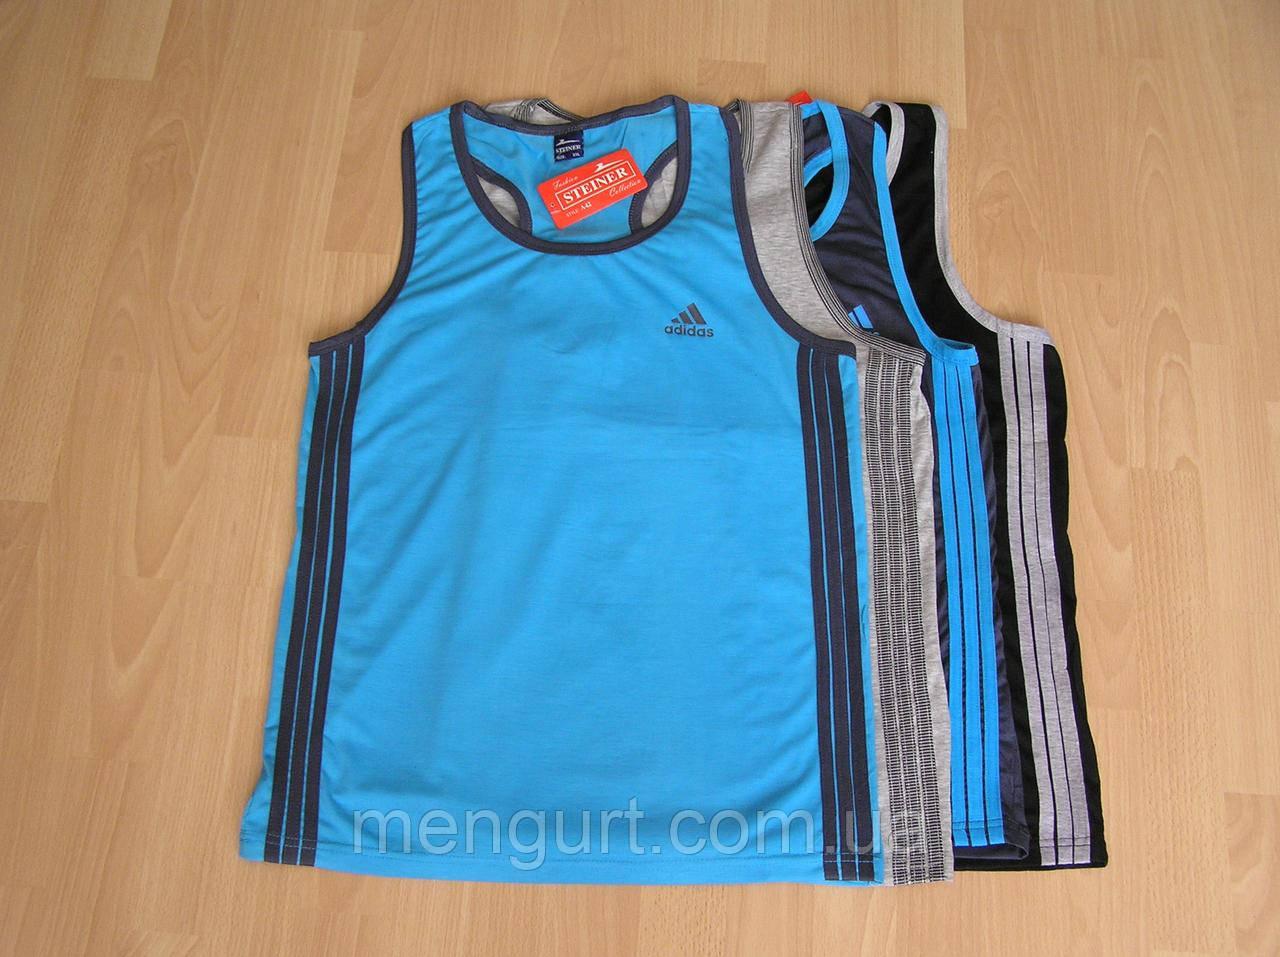 Борцовка(безрукавка,майка) мужская спортивная adidas адидас